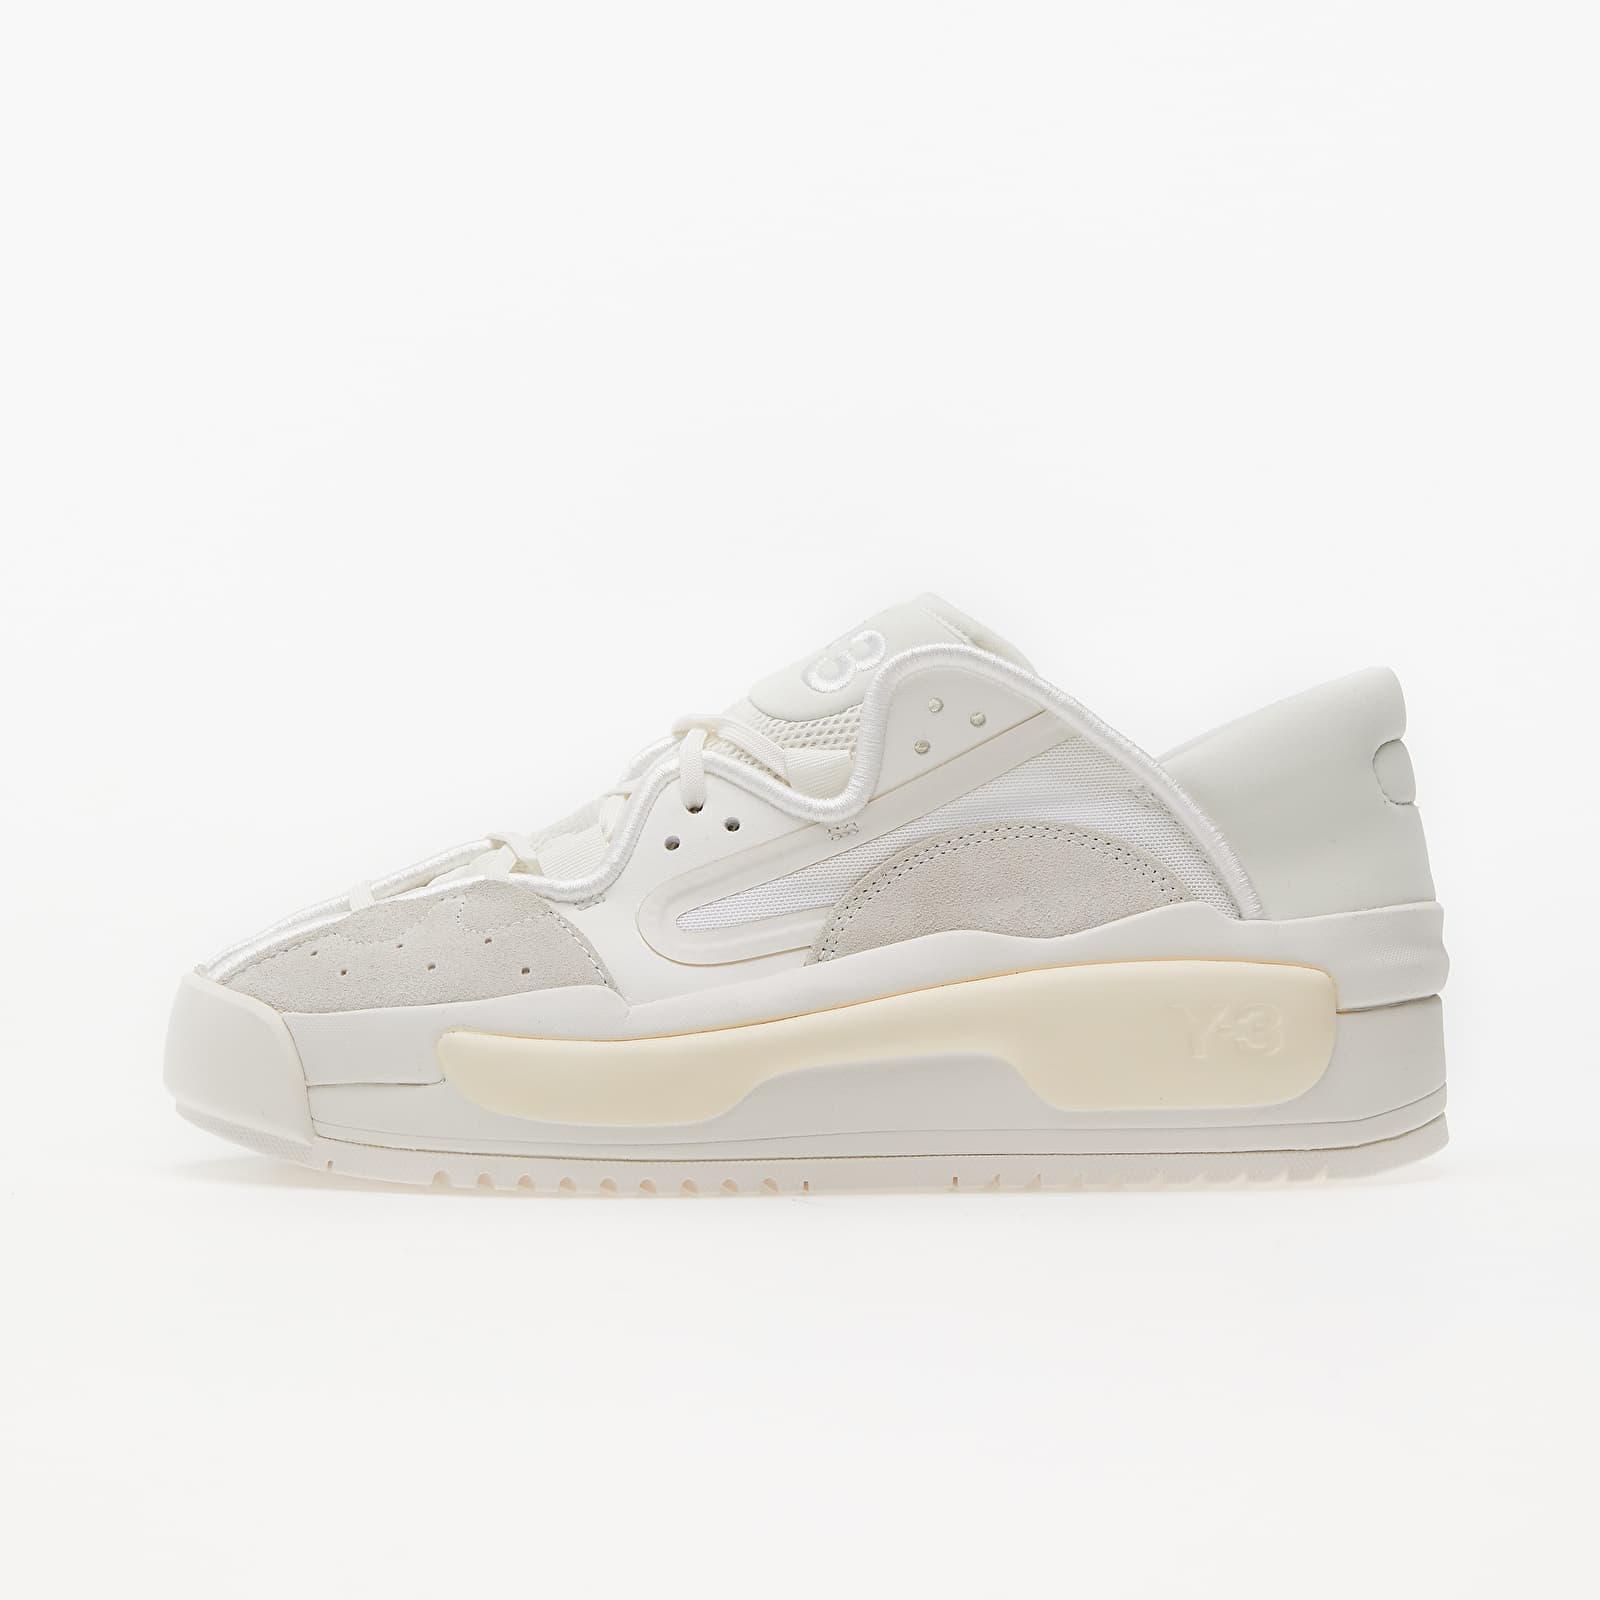 Chaussures et baskets homme Y-3 Hokori II White/ Ecru